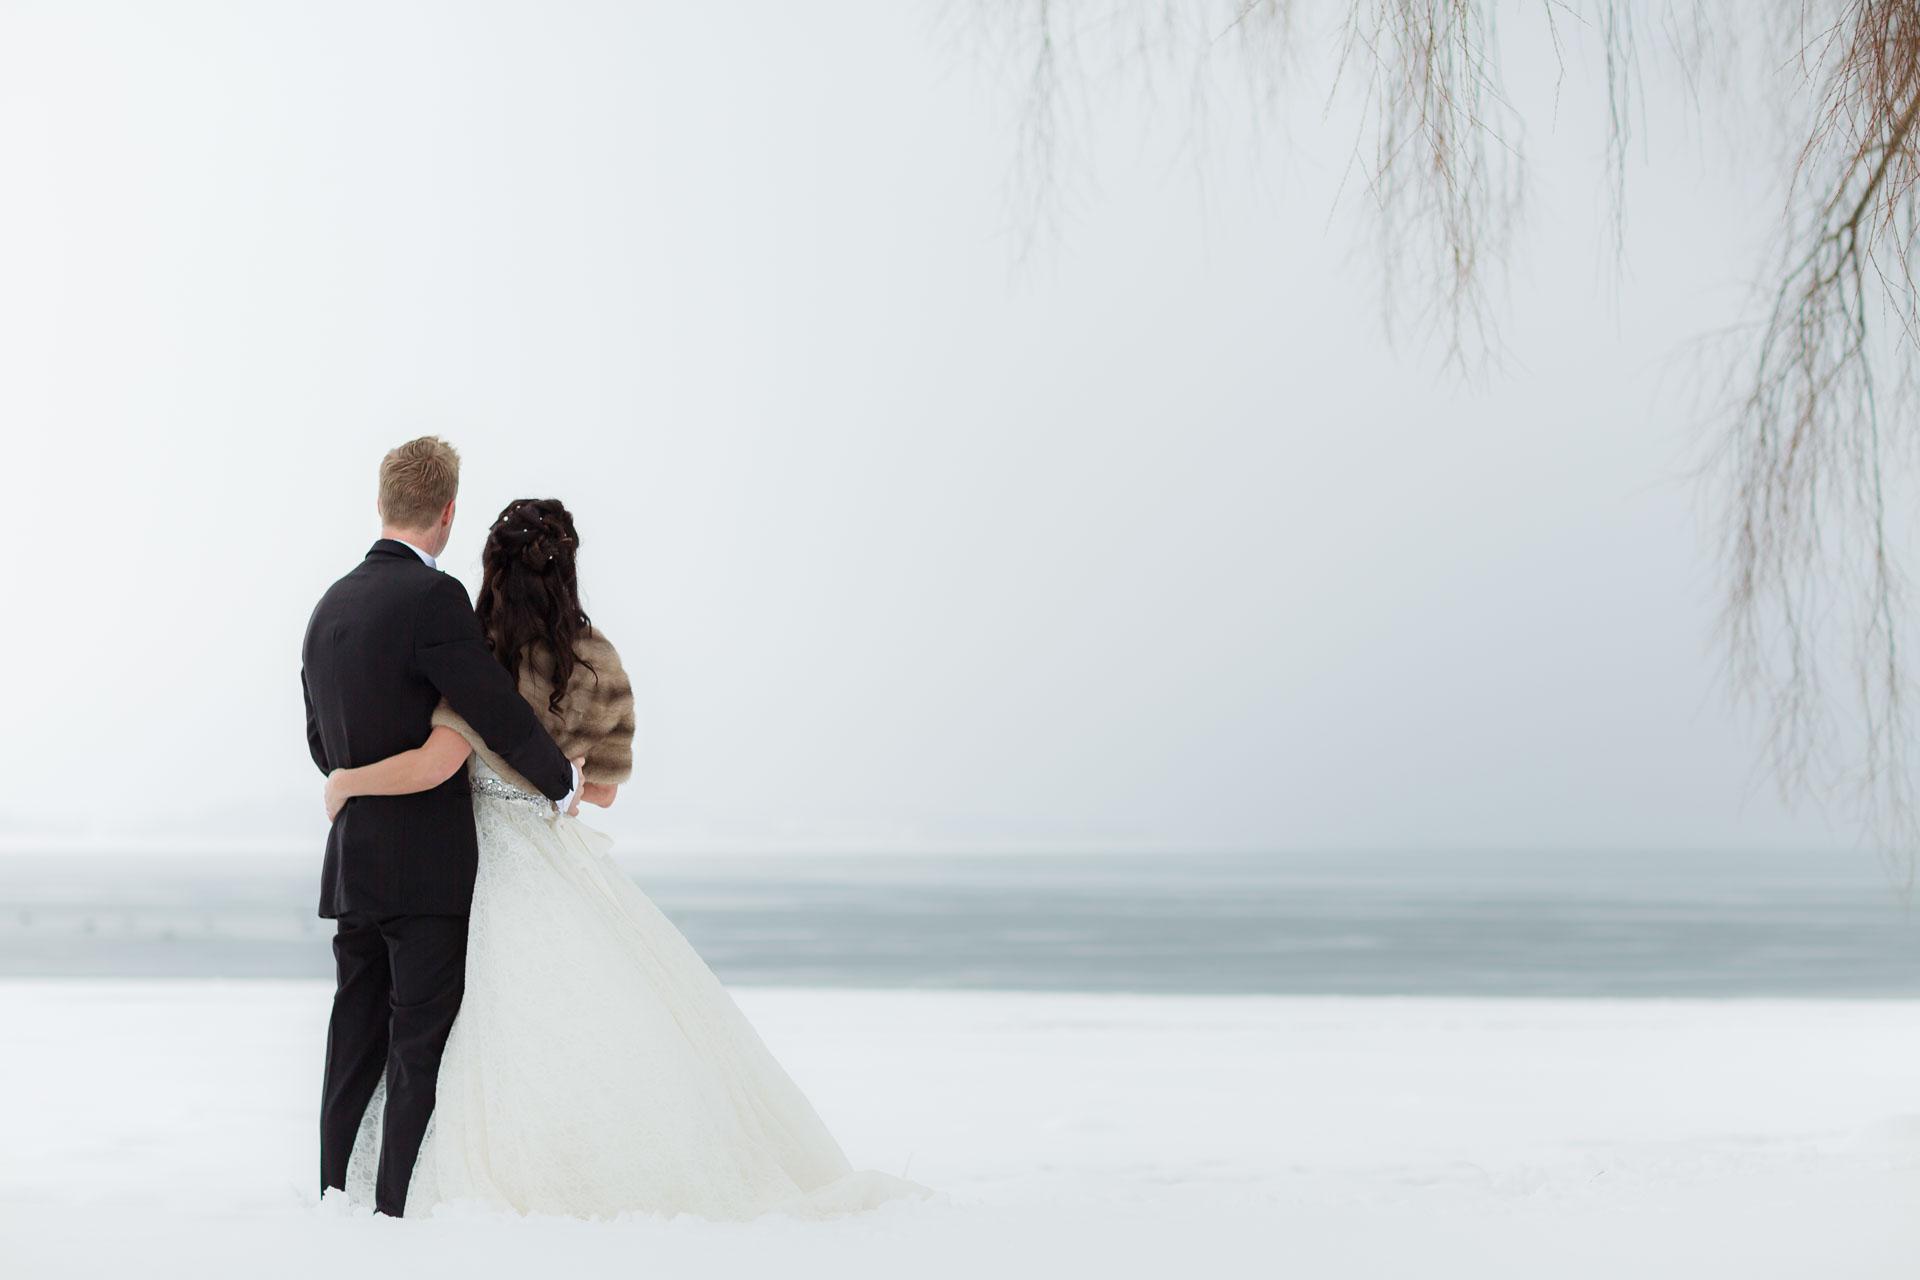 bröllop, vinterbröllop, vadstena, östergötland, sverige, bröllopsfotograf, winter wedding, wedding photographer, sweden